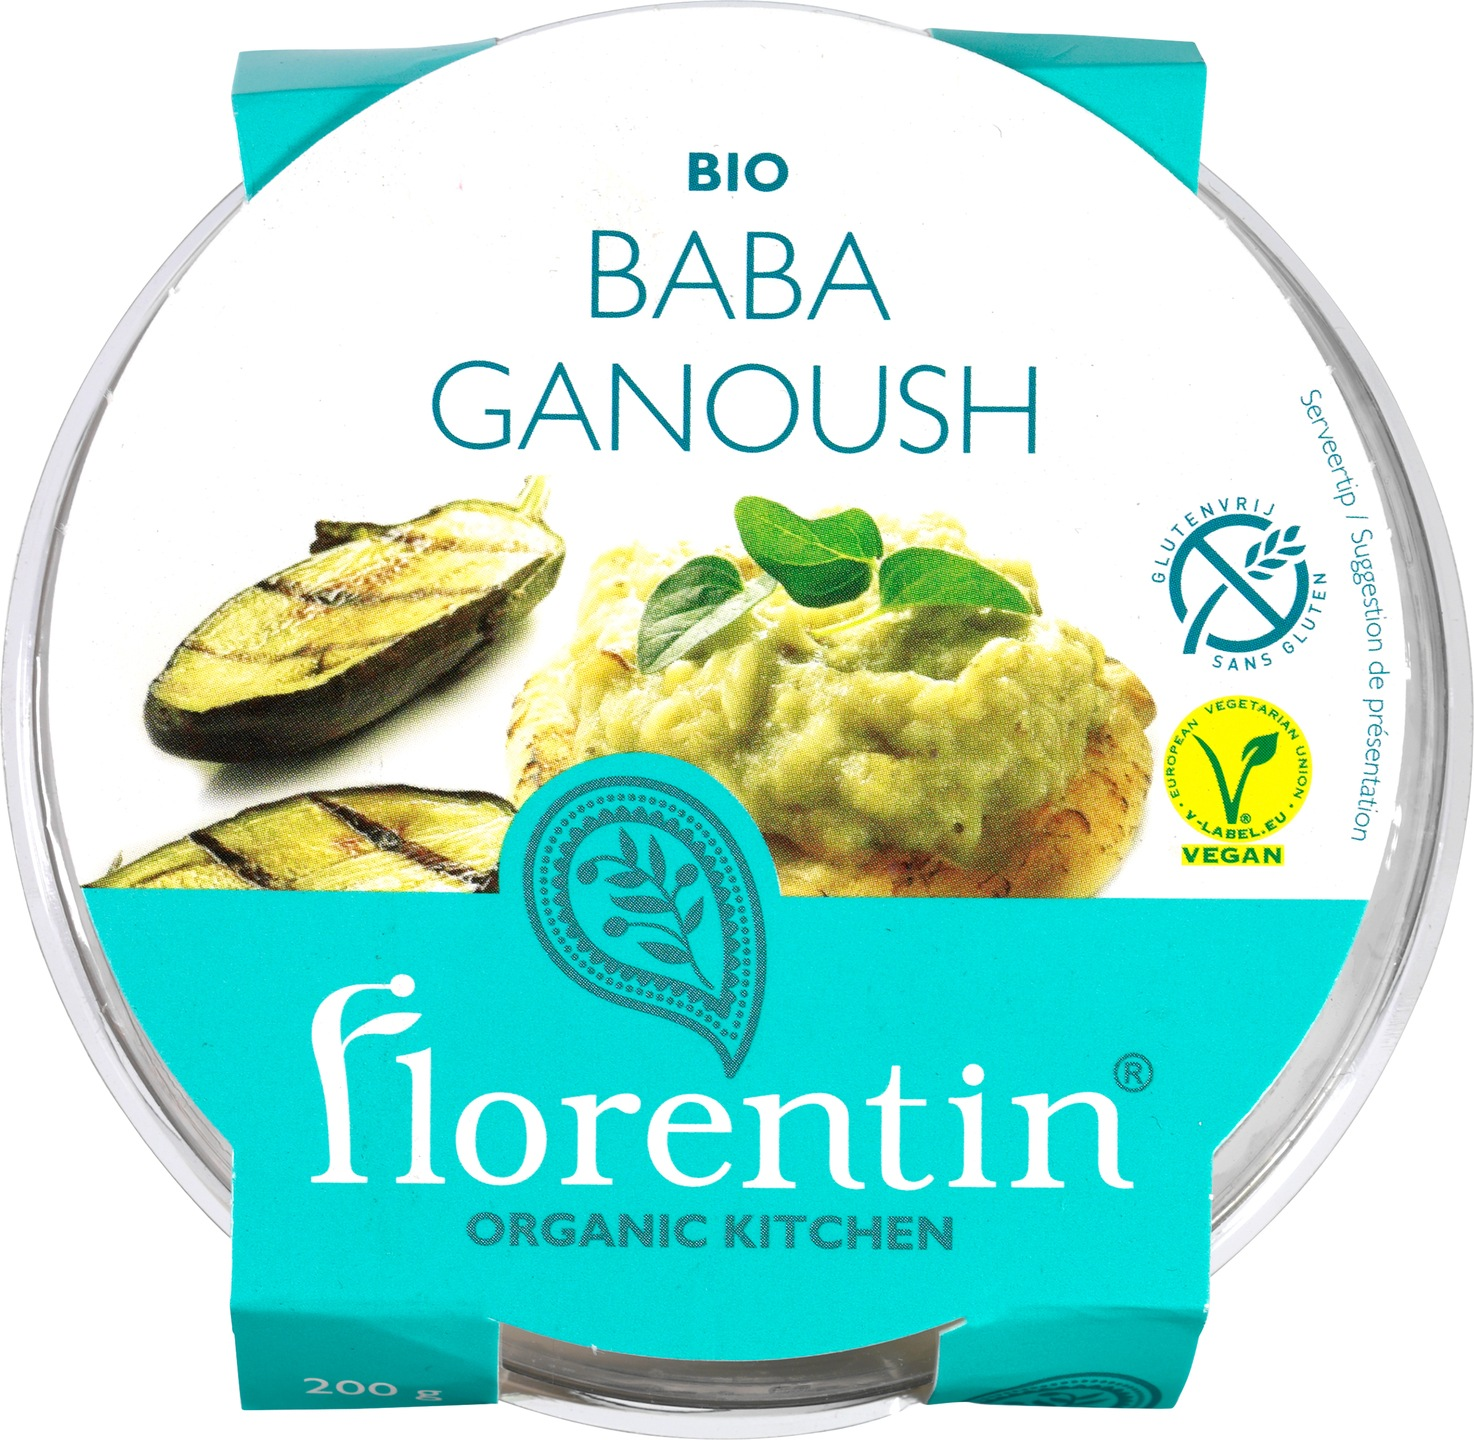 Biologische Florentin Salade baba ganoush 200 gr